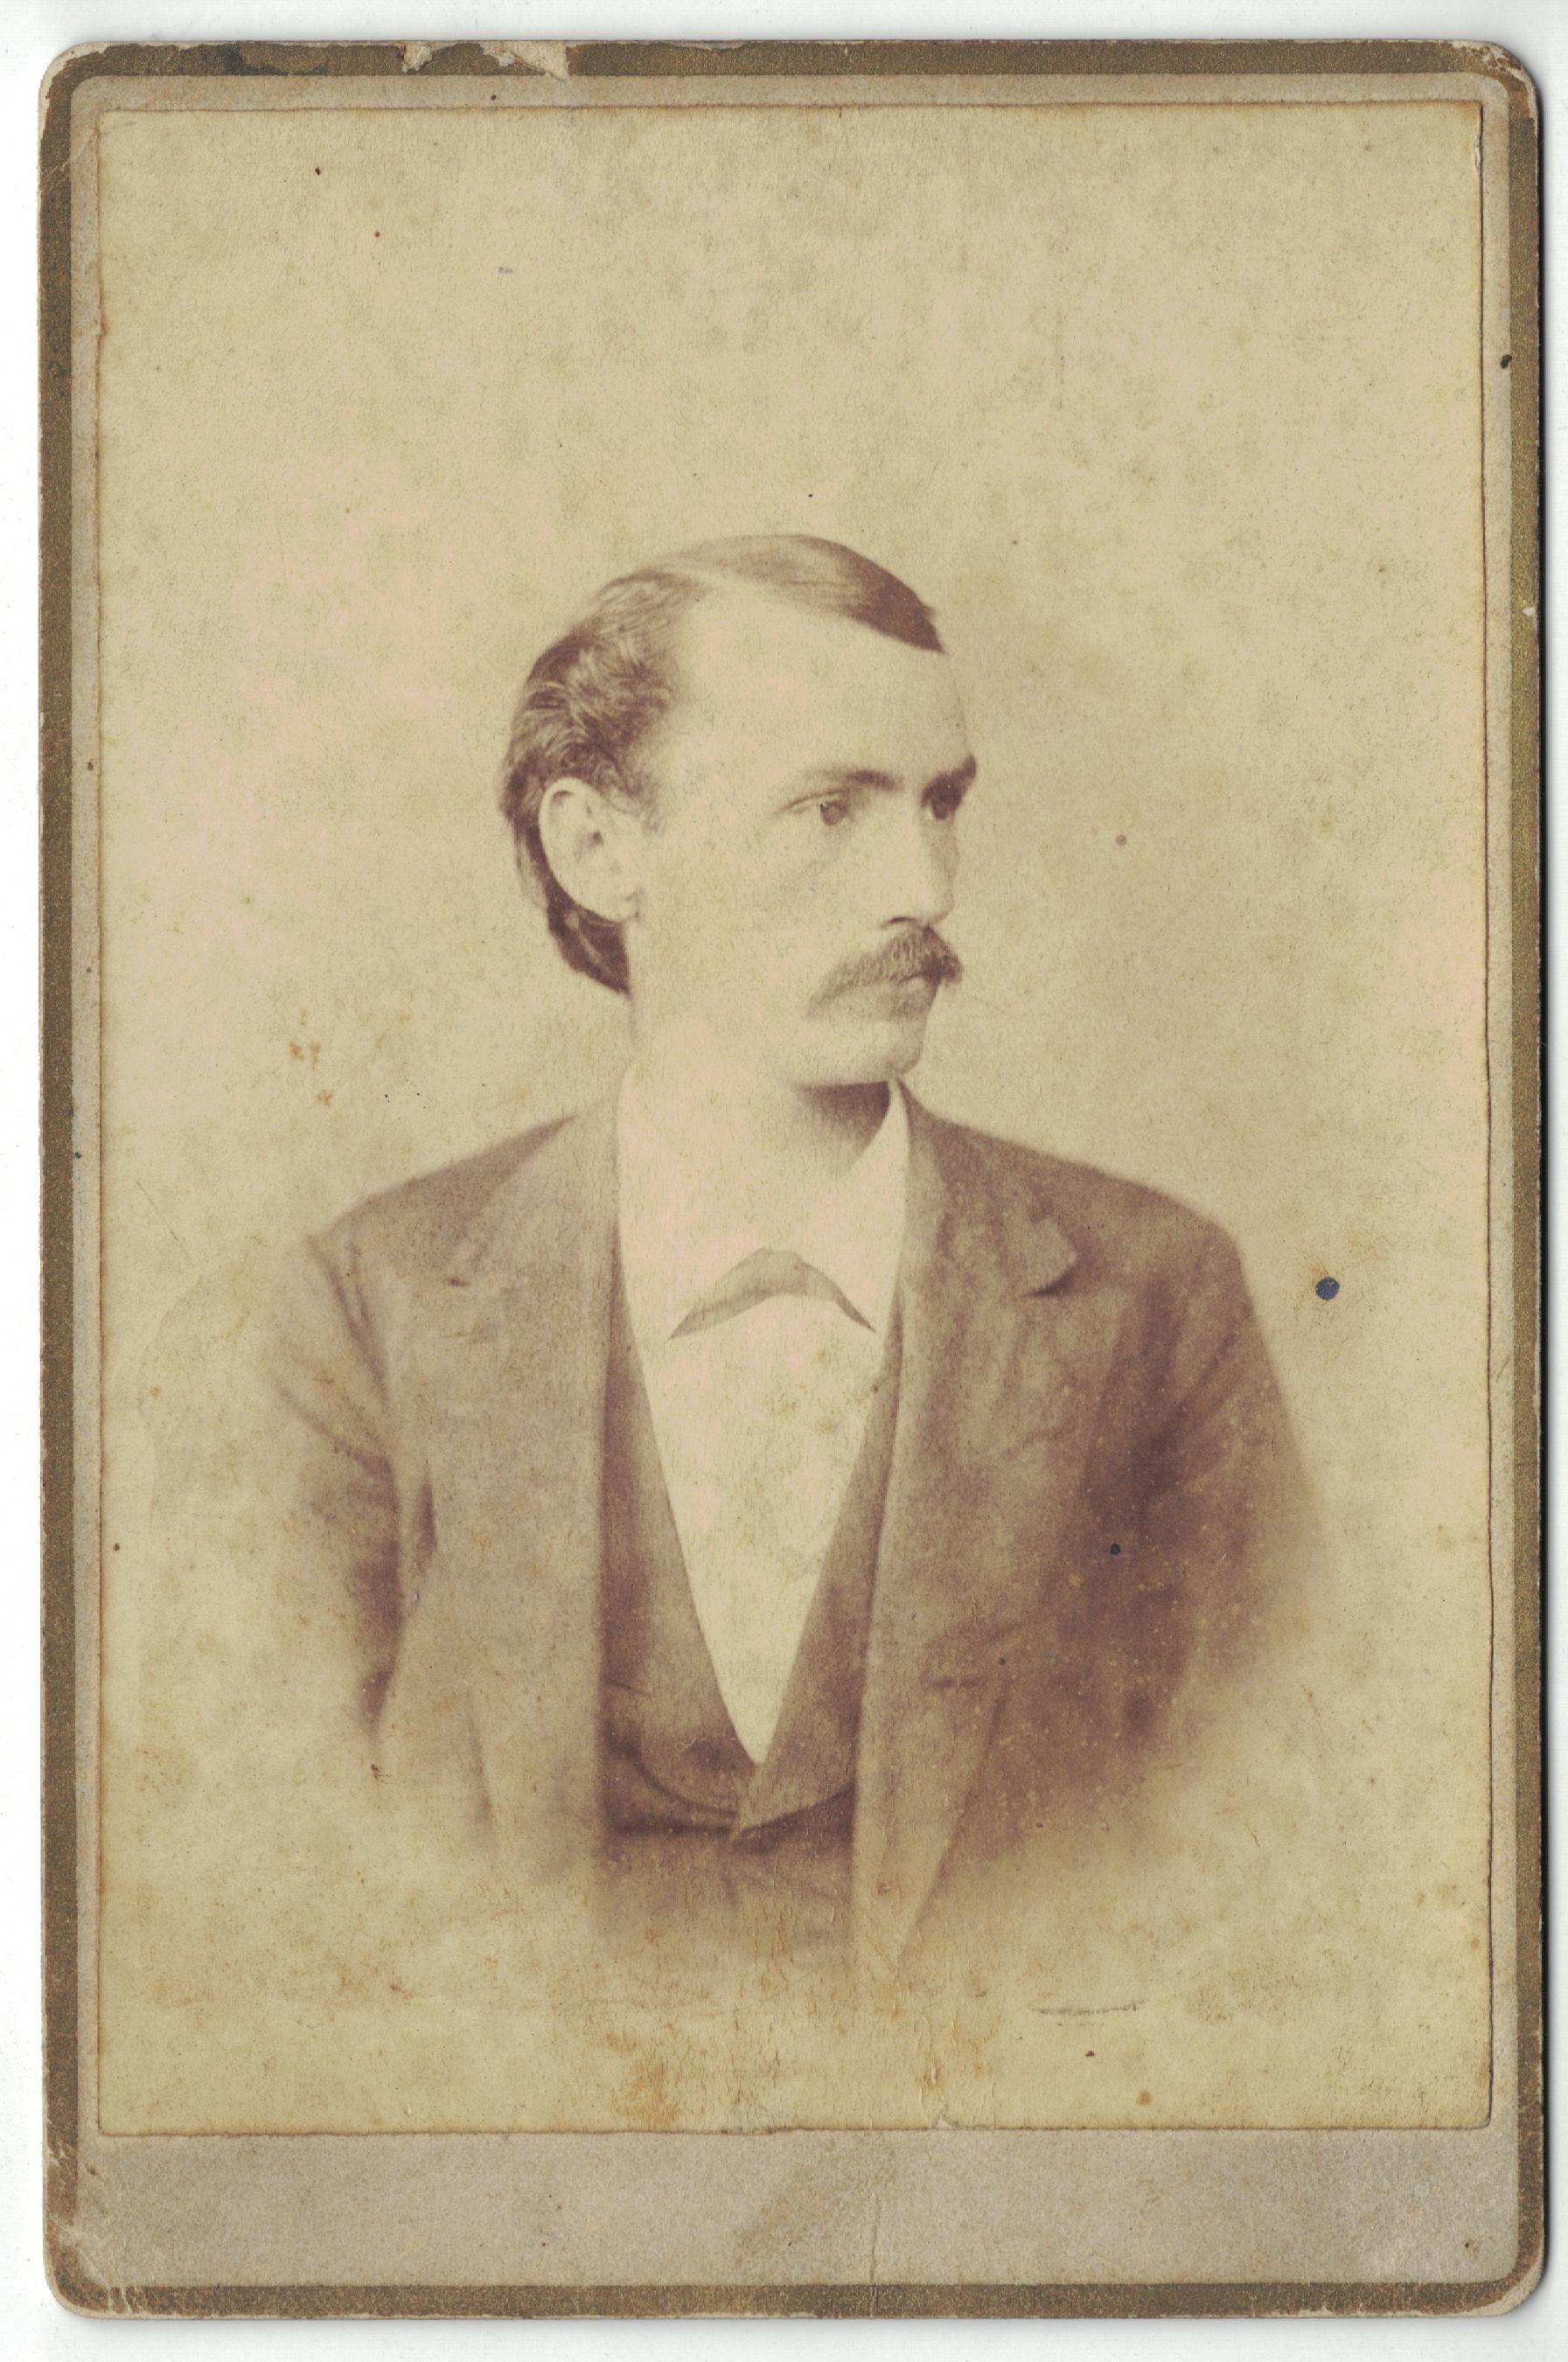 Willie Mabry